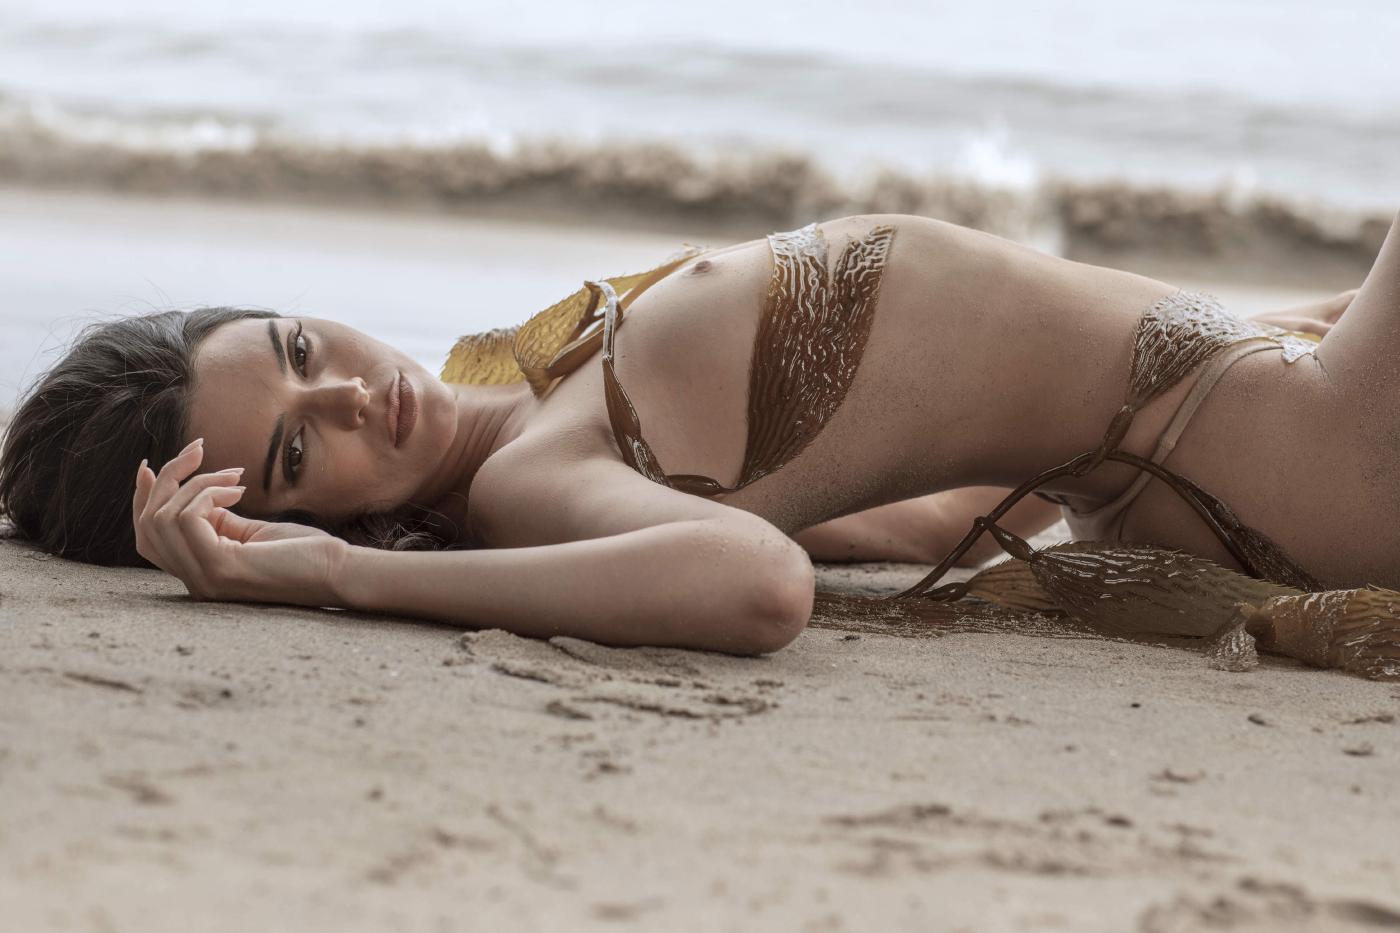 Kendall Jenner Nude Angels Magazine Photoshoot Havpwr